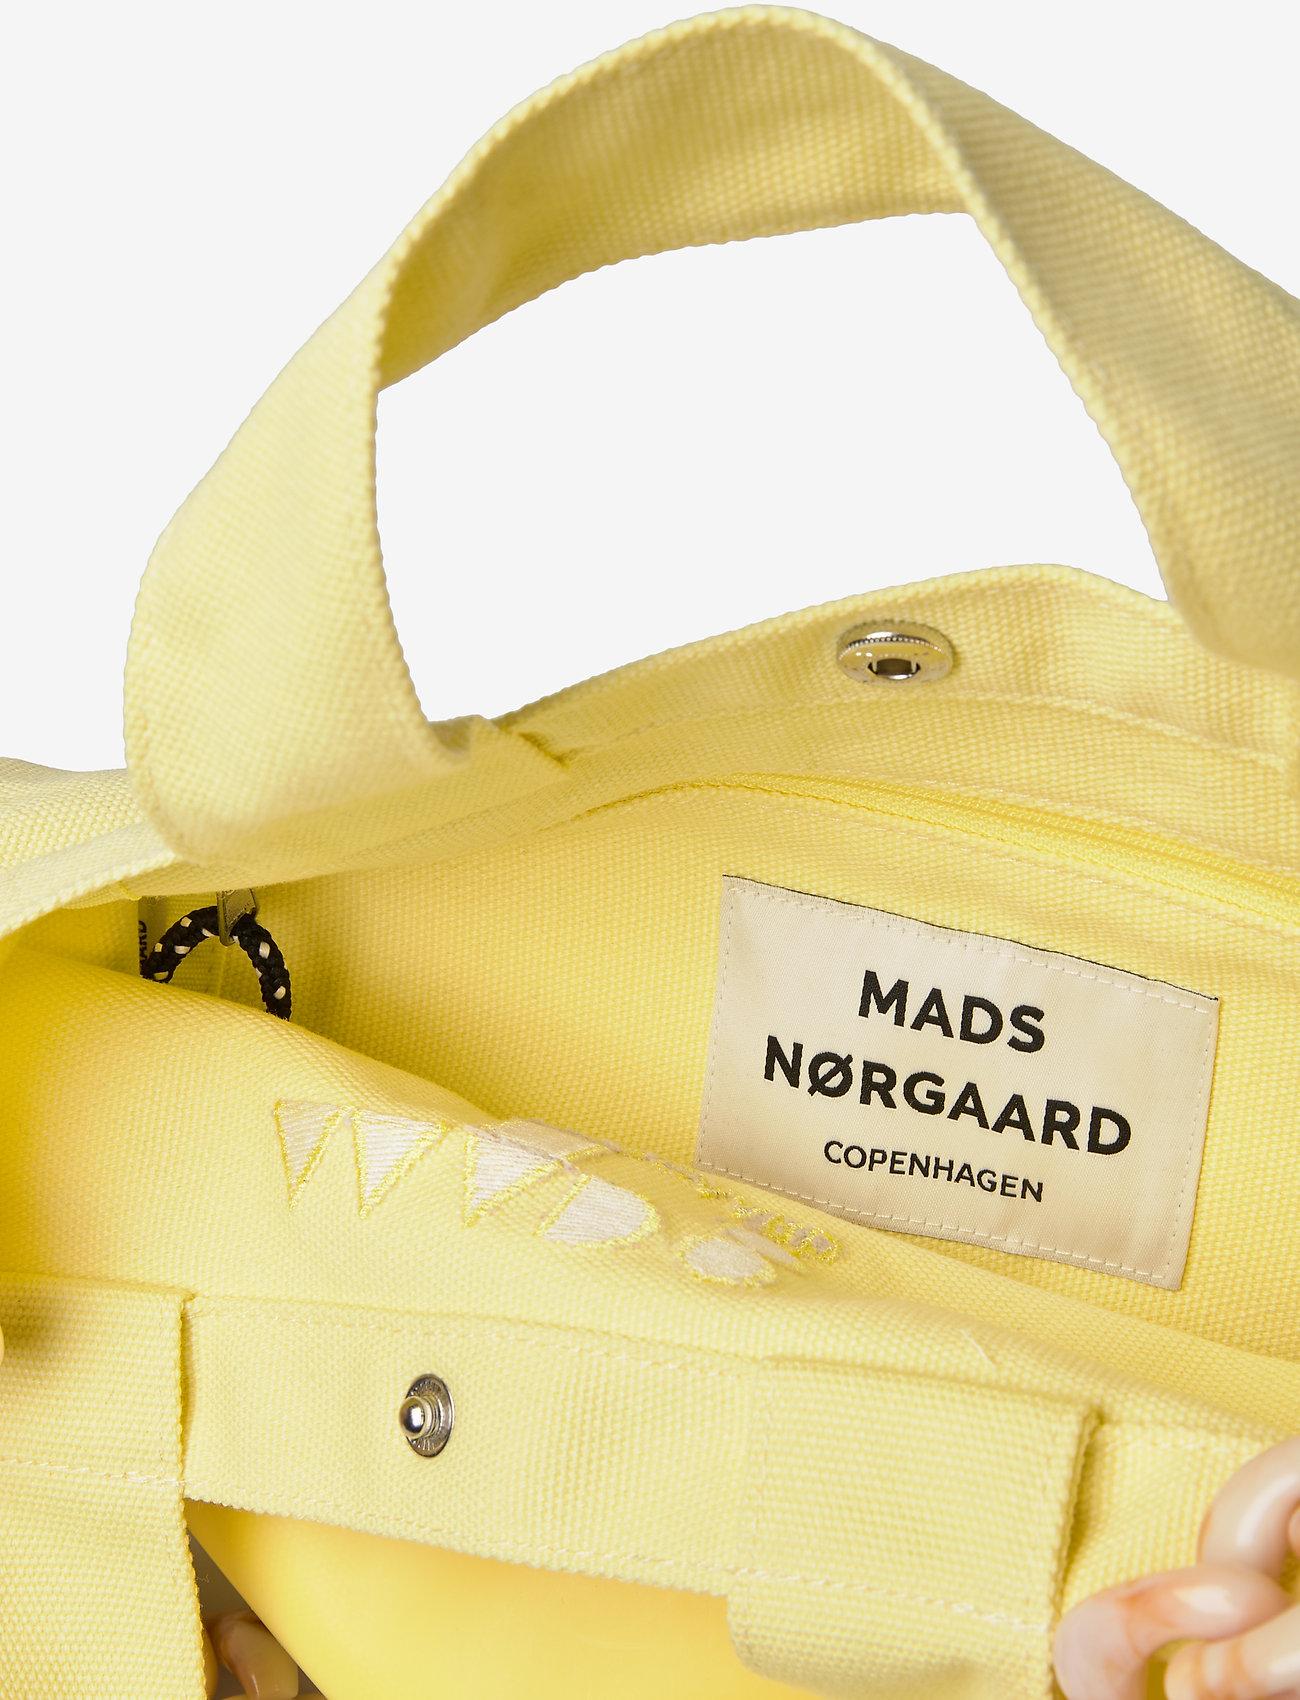 Mads Nørgaard Töte Bag Y - Torebki SOFT YELLOW - Torby